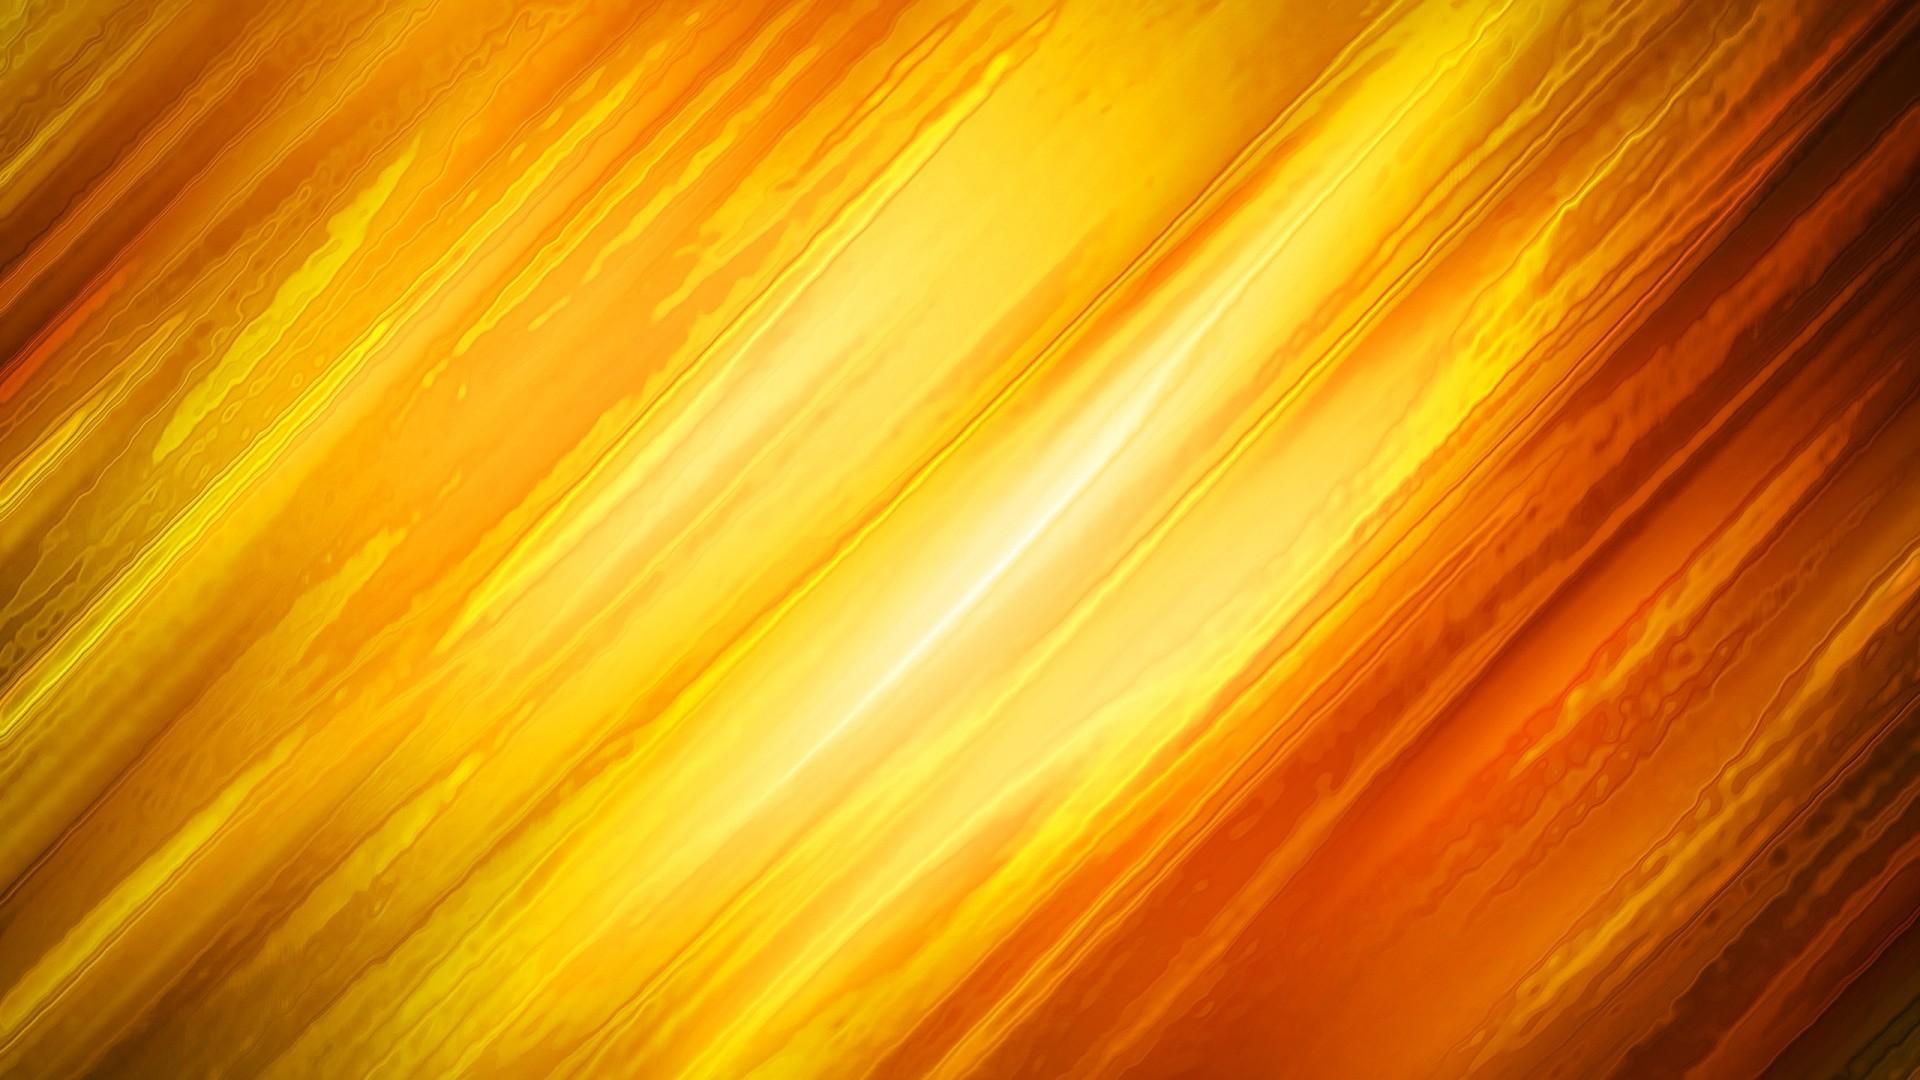 Orange Yellow Background wallpaper – 742489